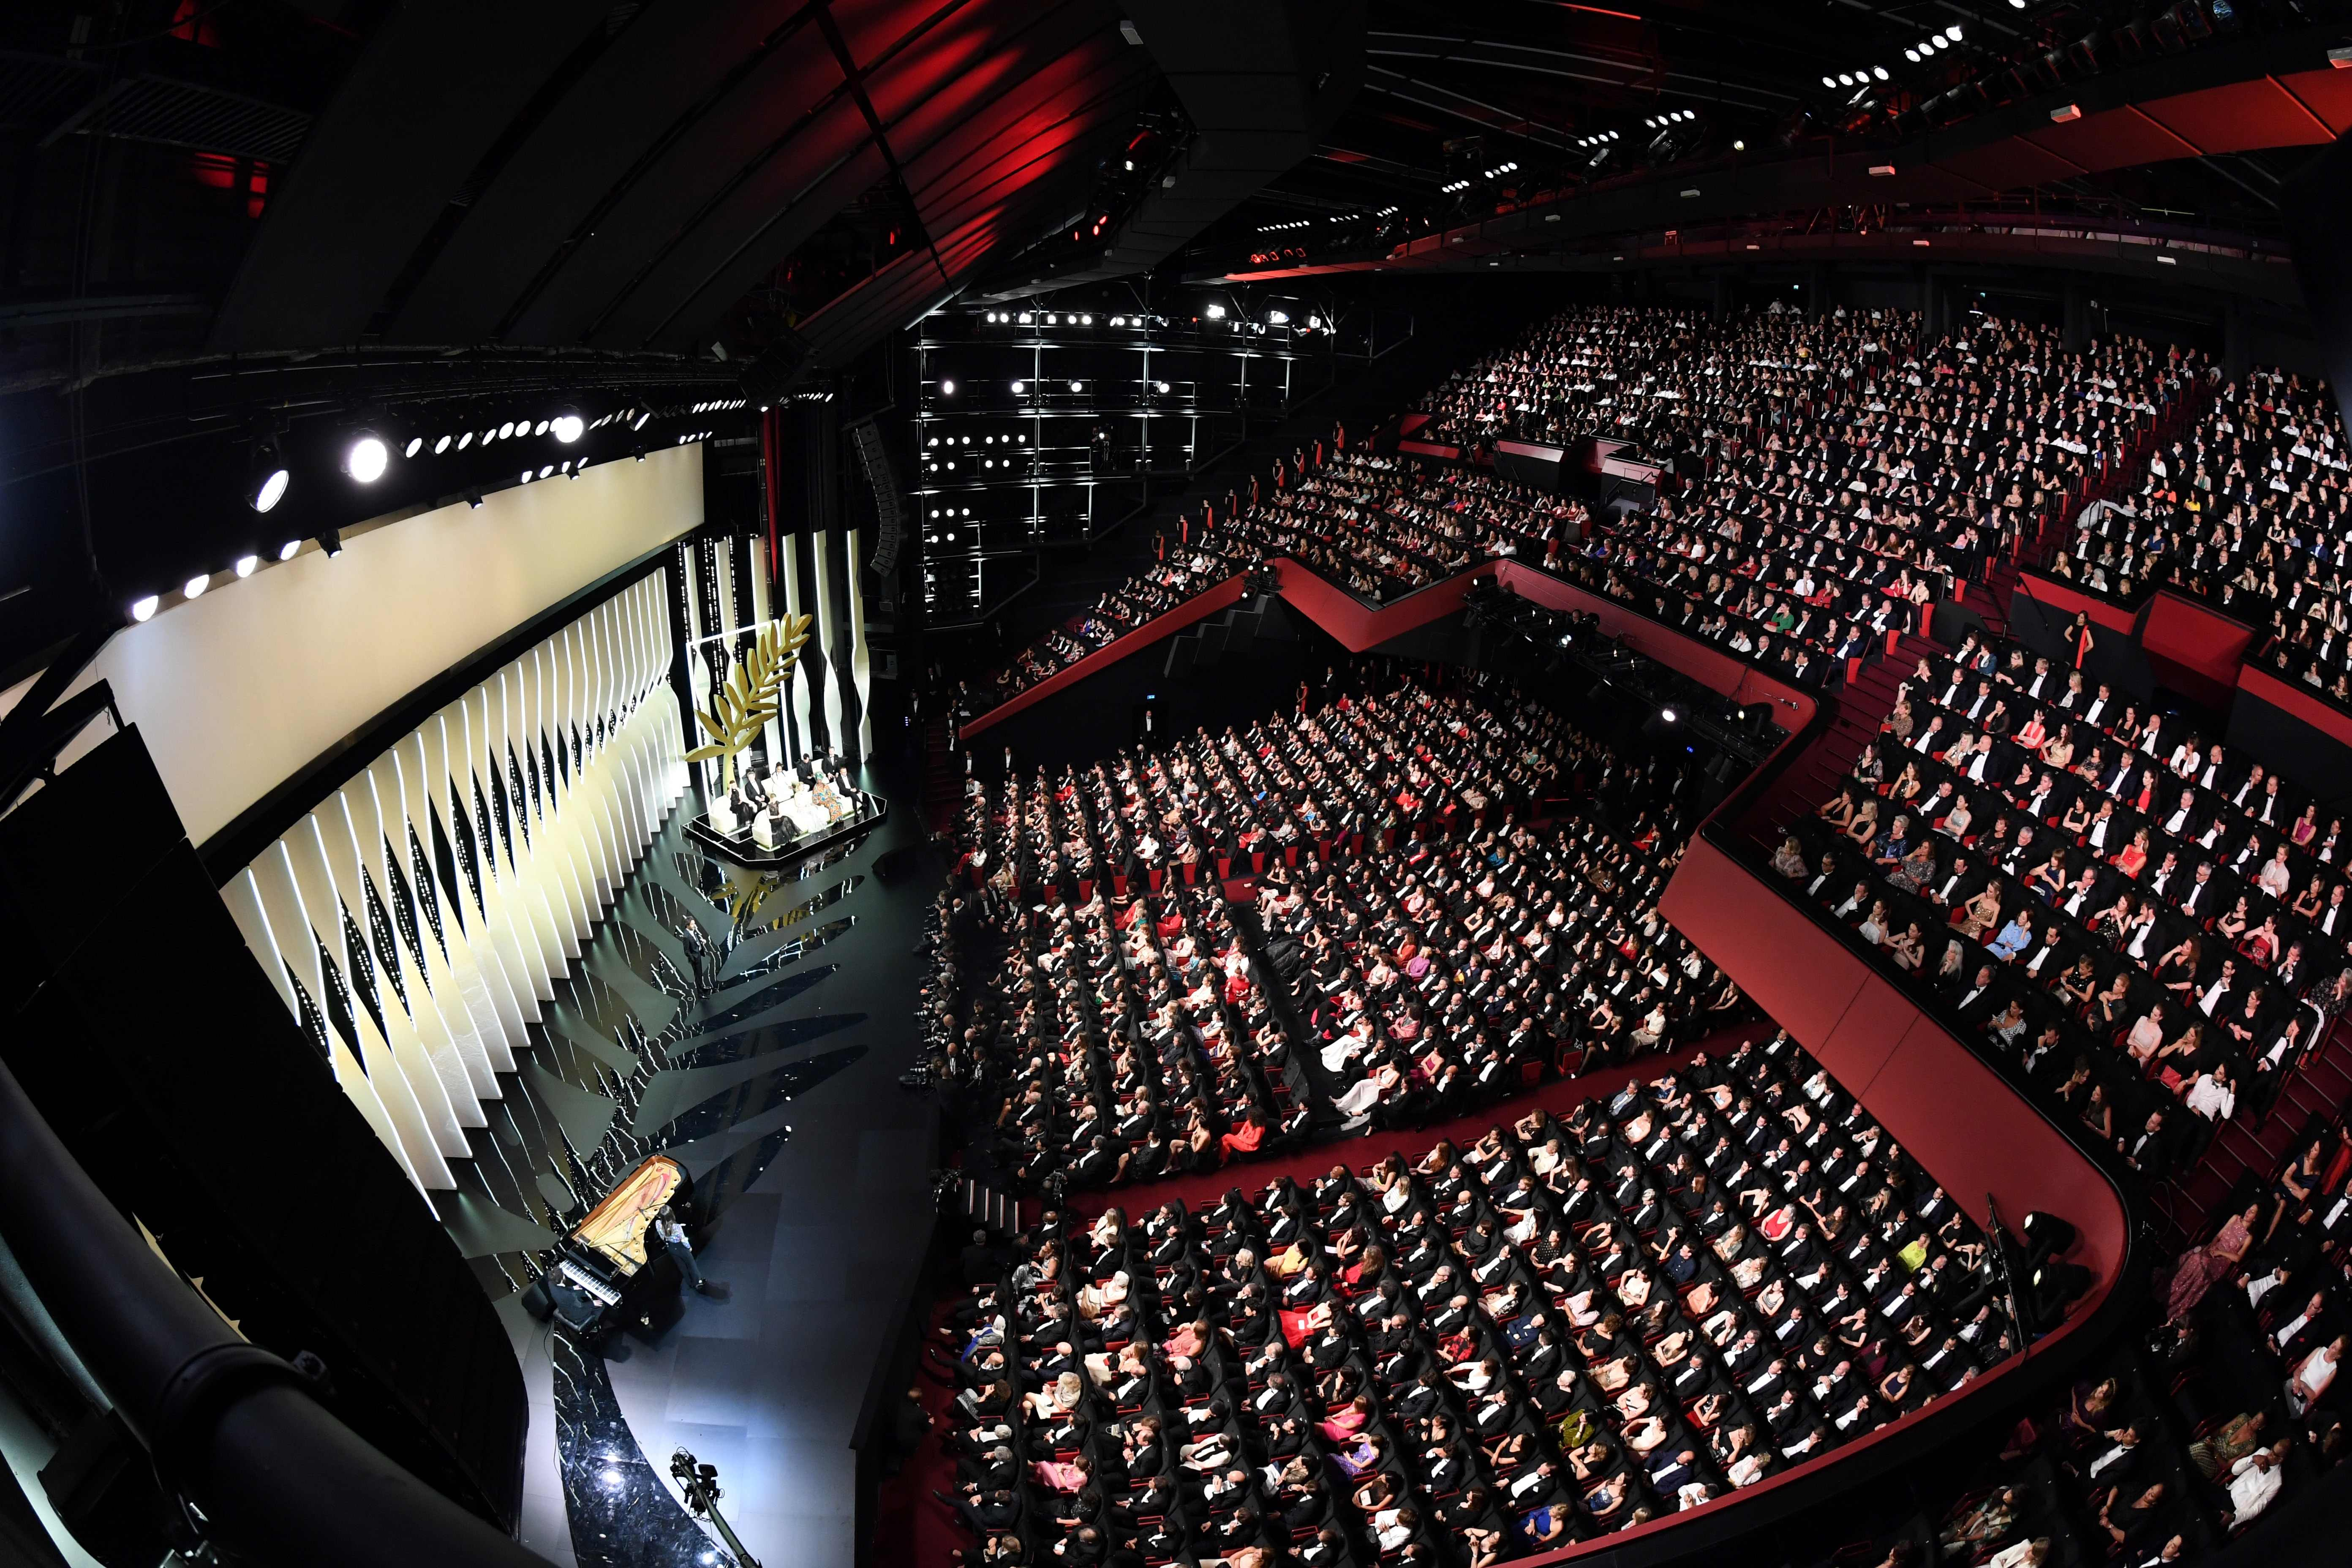 Produtor português vai processar Festival de Cinema de Cannes